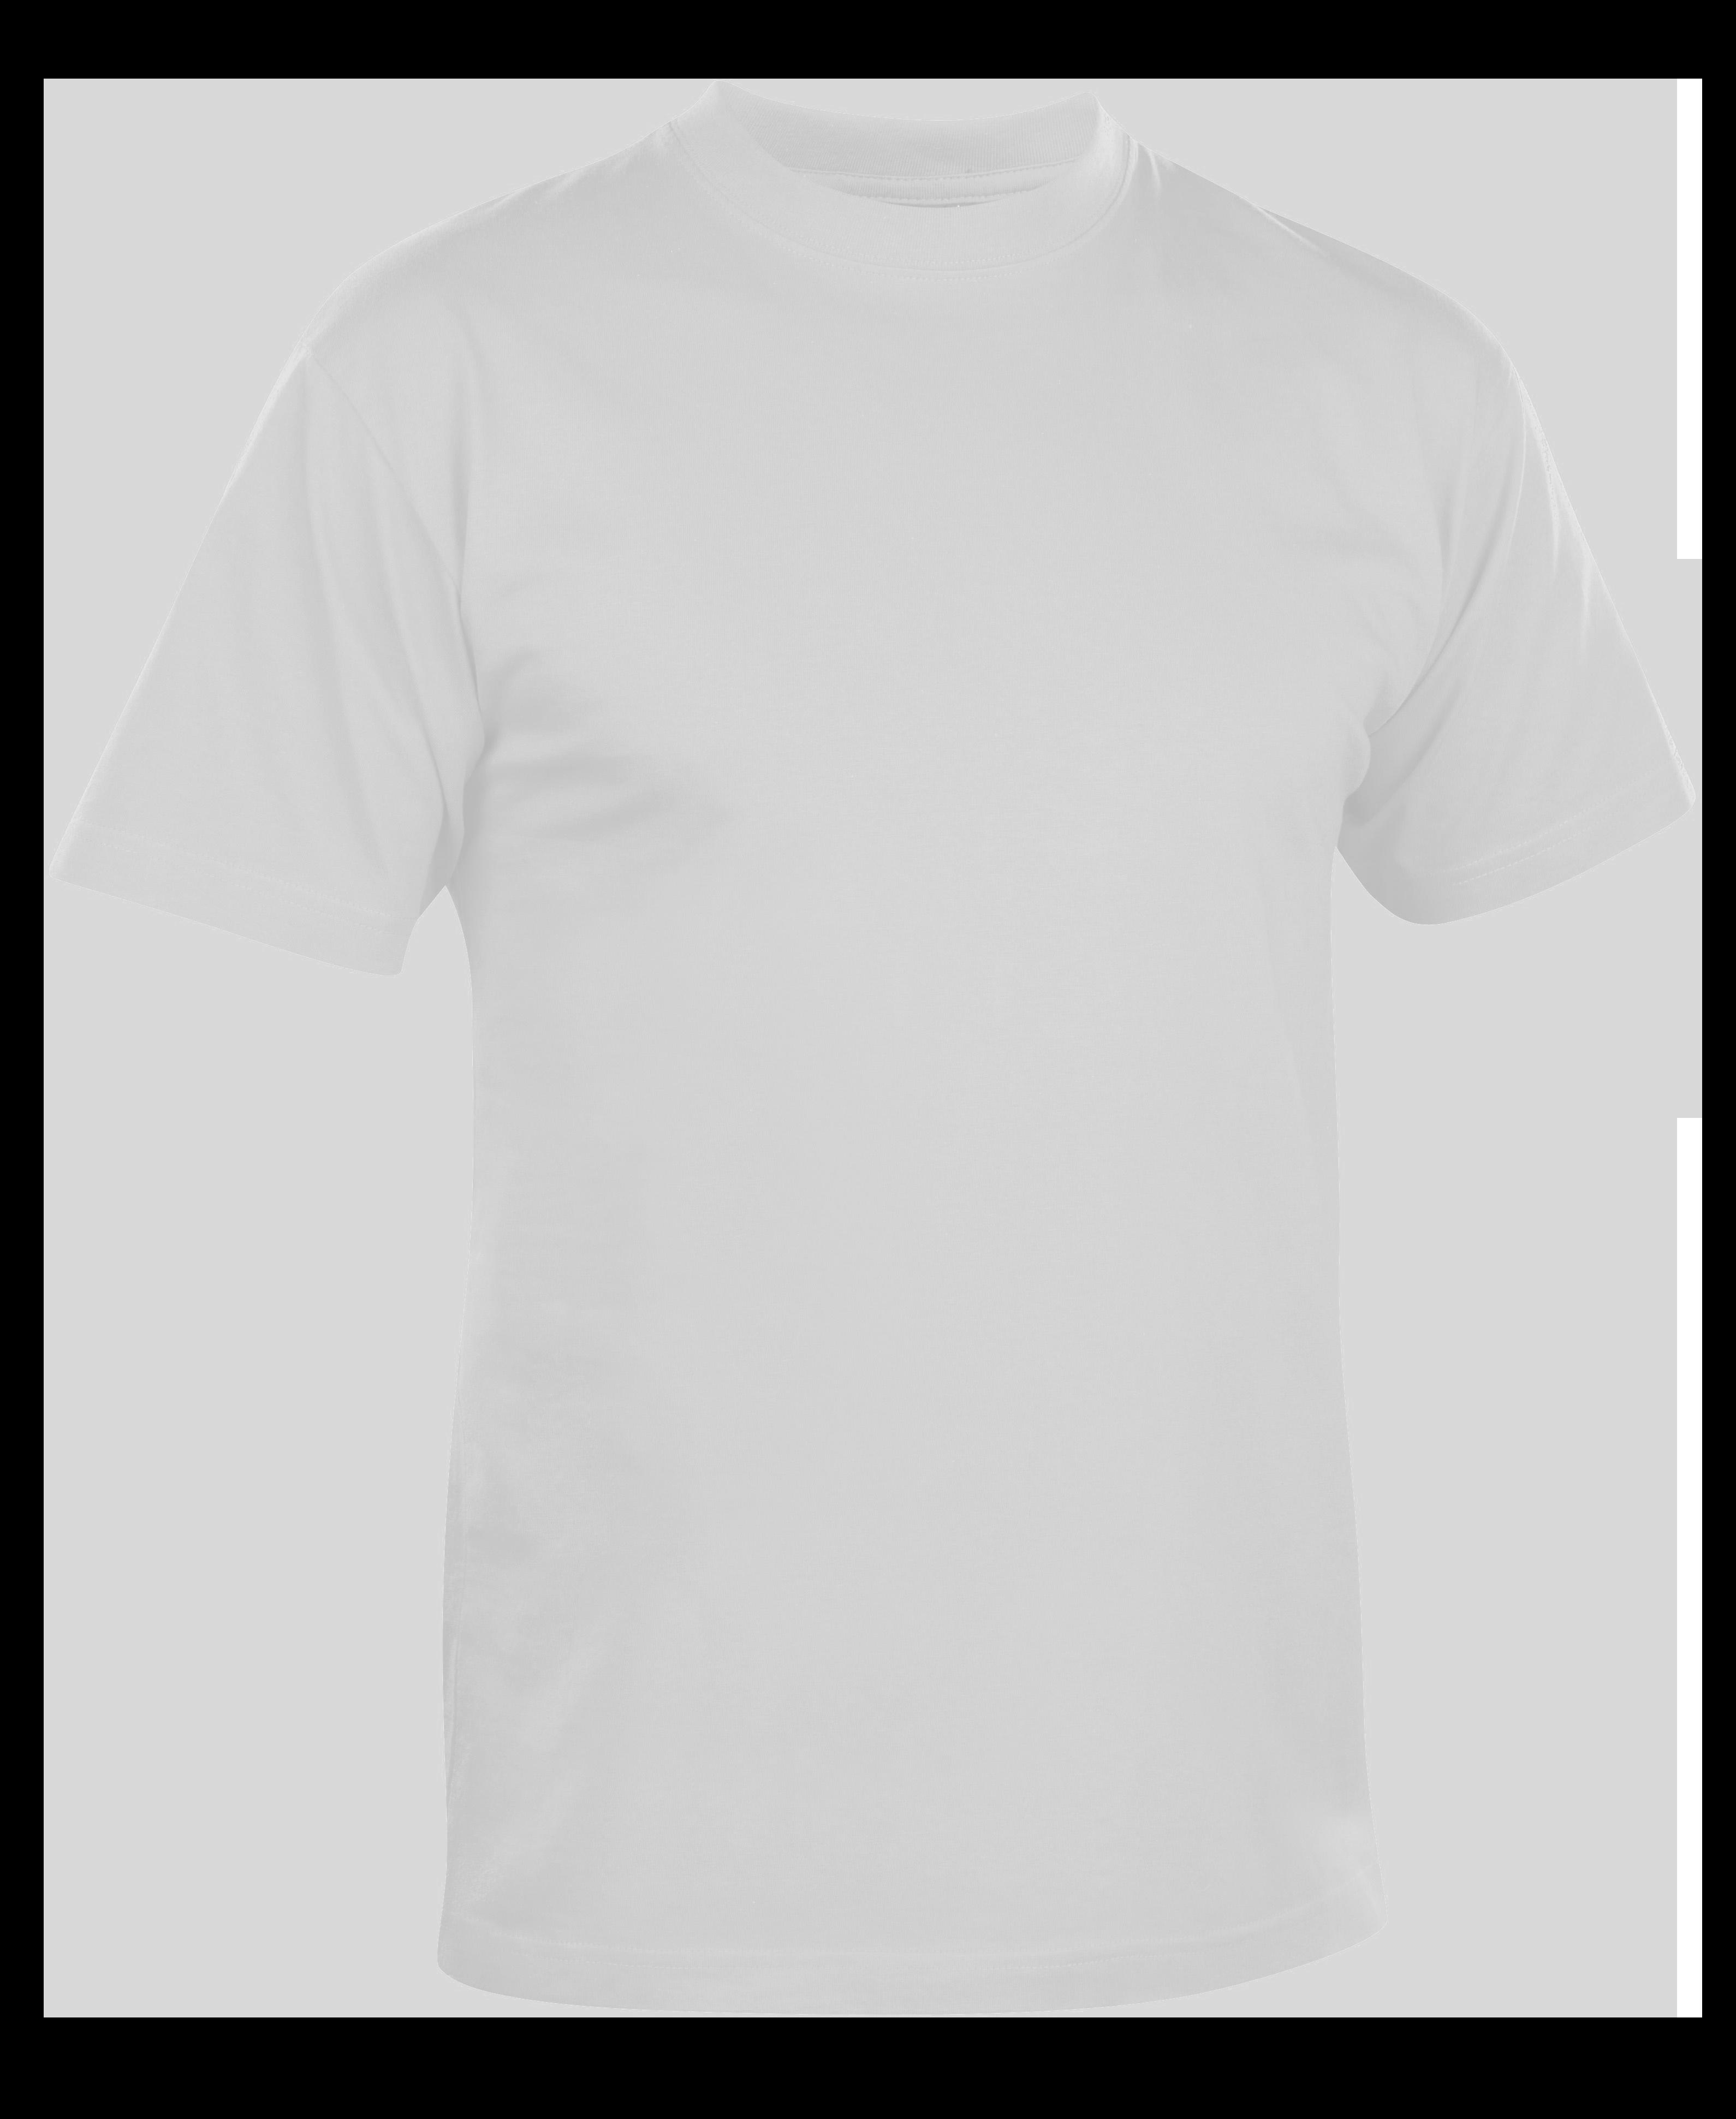 White T Shirt Png Image T Shirt Png T Shirt Image White Tshirt